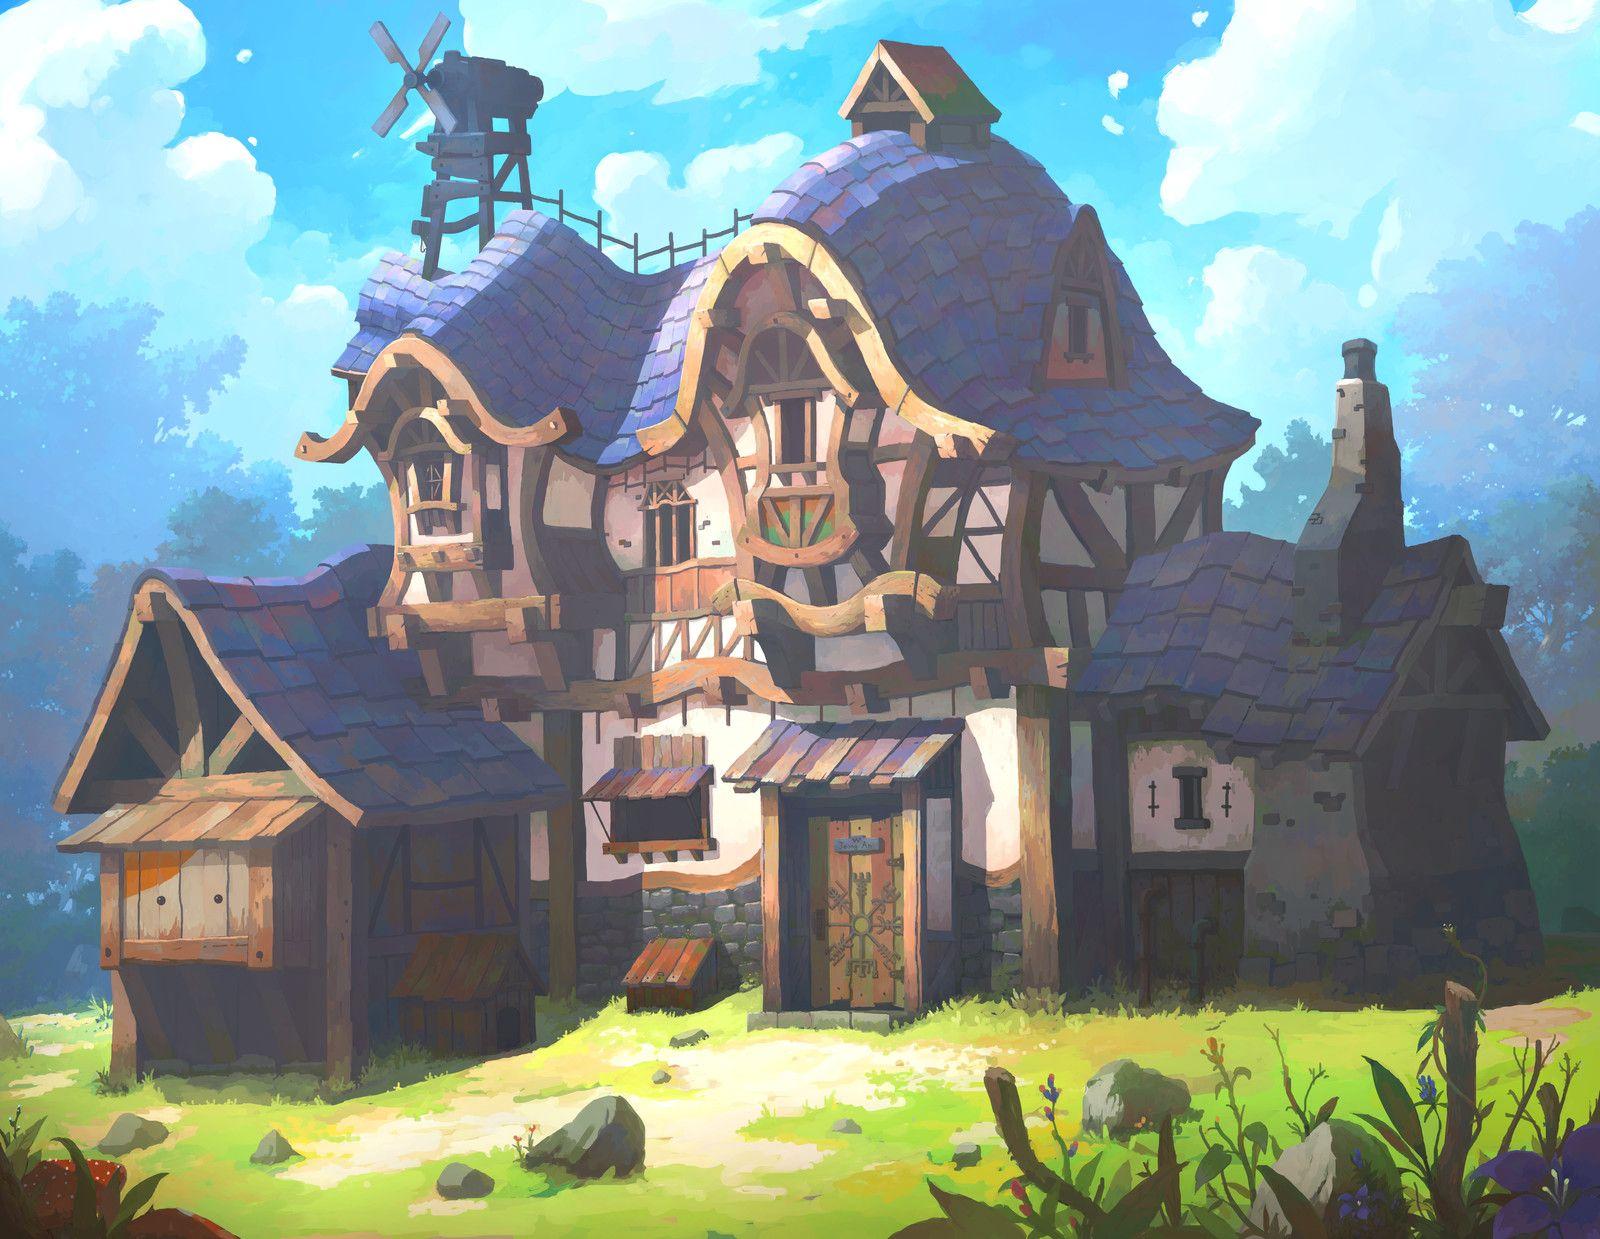 Purple House Oku On Artstation At Https Www Artstation Com